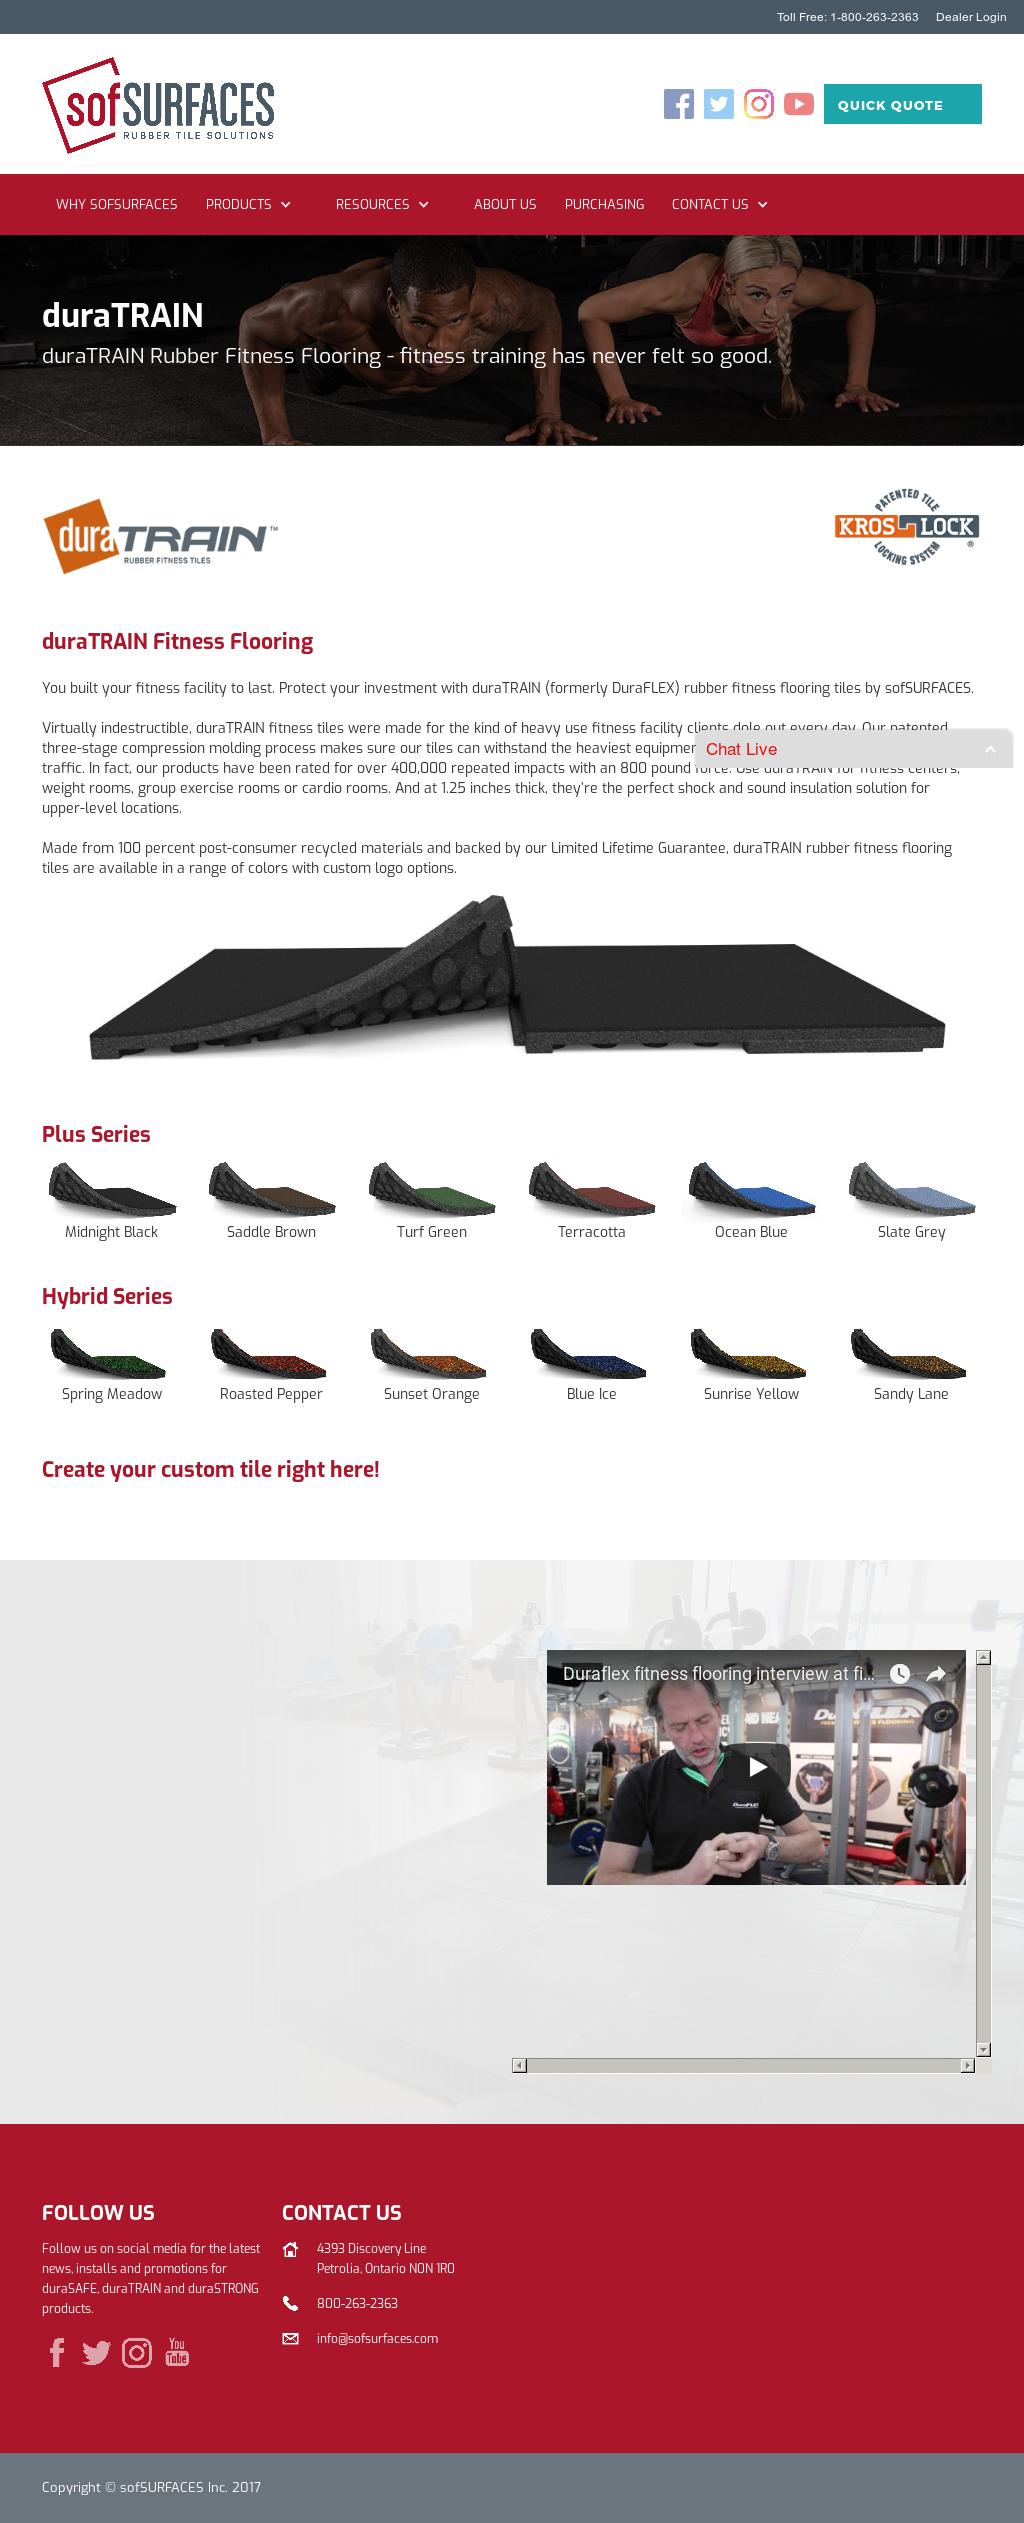 DuraFLEX Competitors, Revenue and Employees - Owler Company Profile